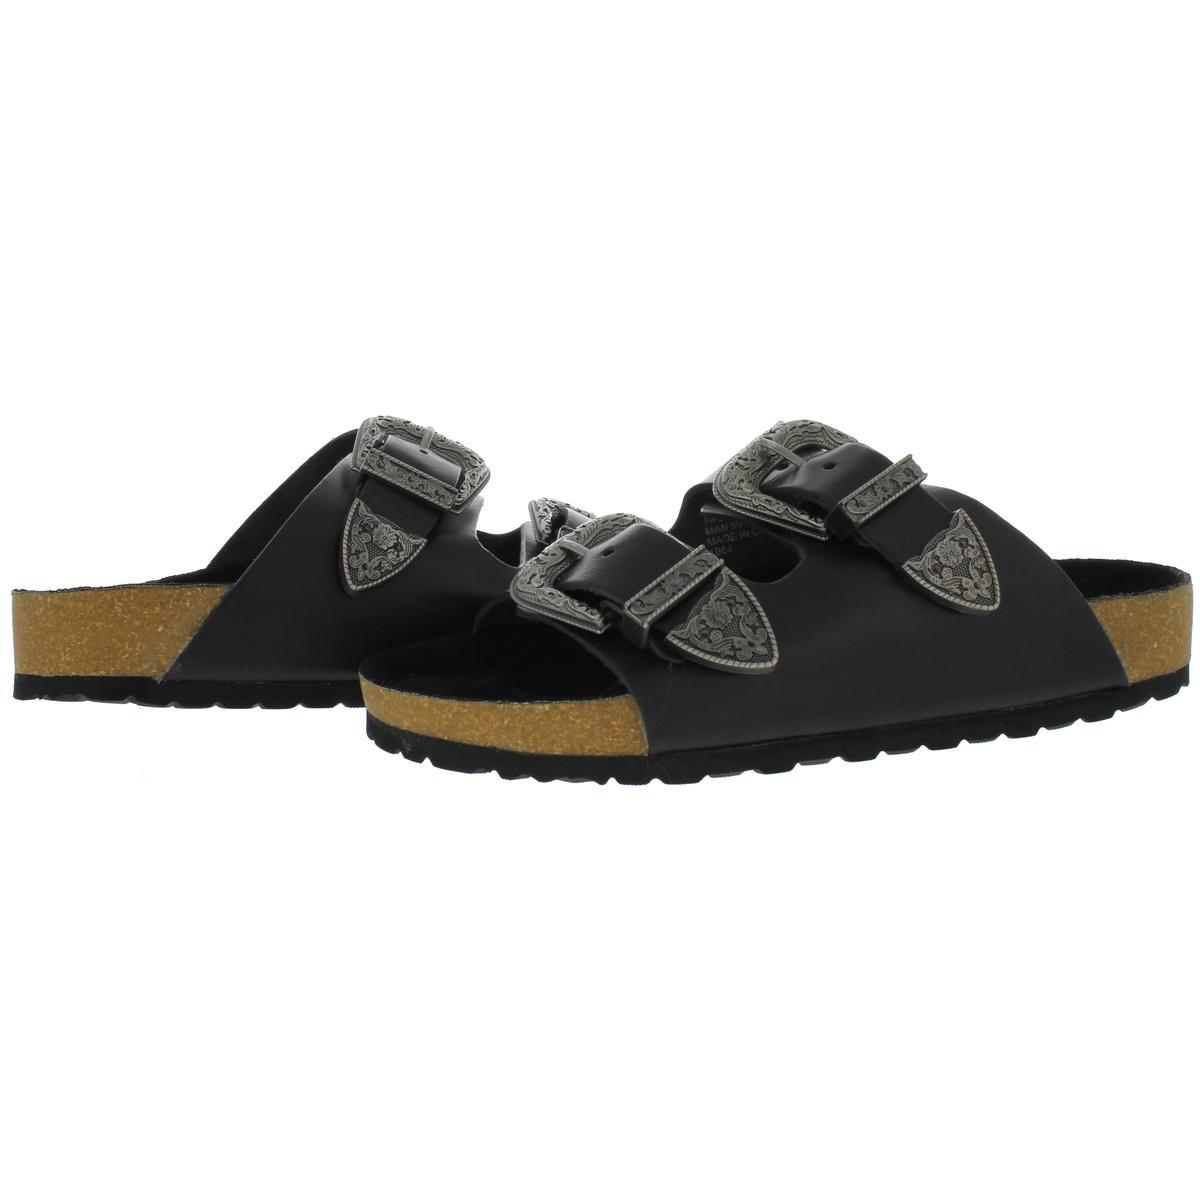 611417775aa Steve Madden Womens Smoke Open Toe Double Strap Slide Sandals Shoes ...